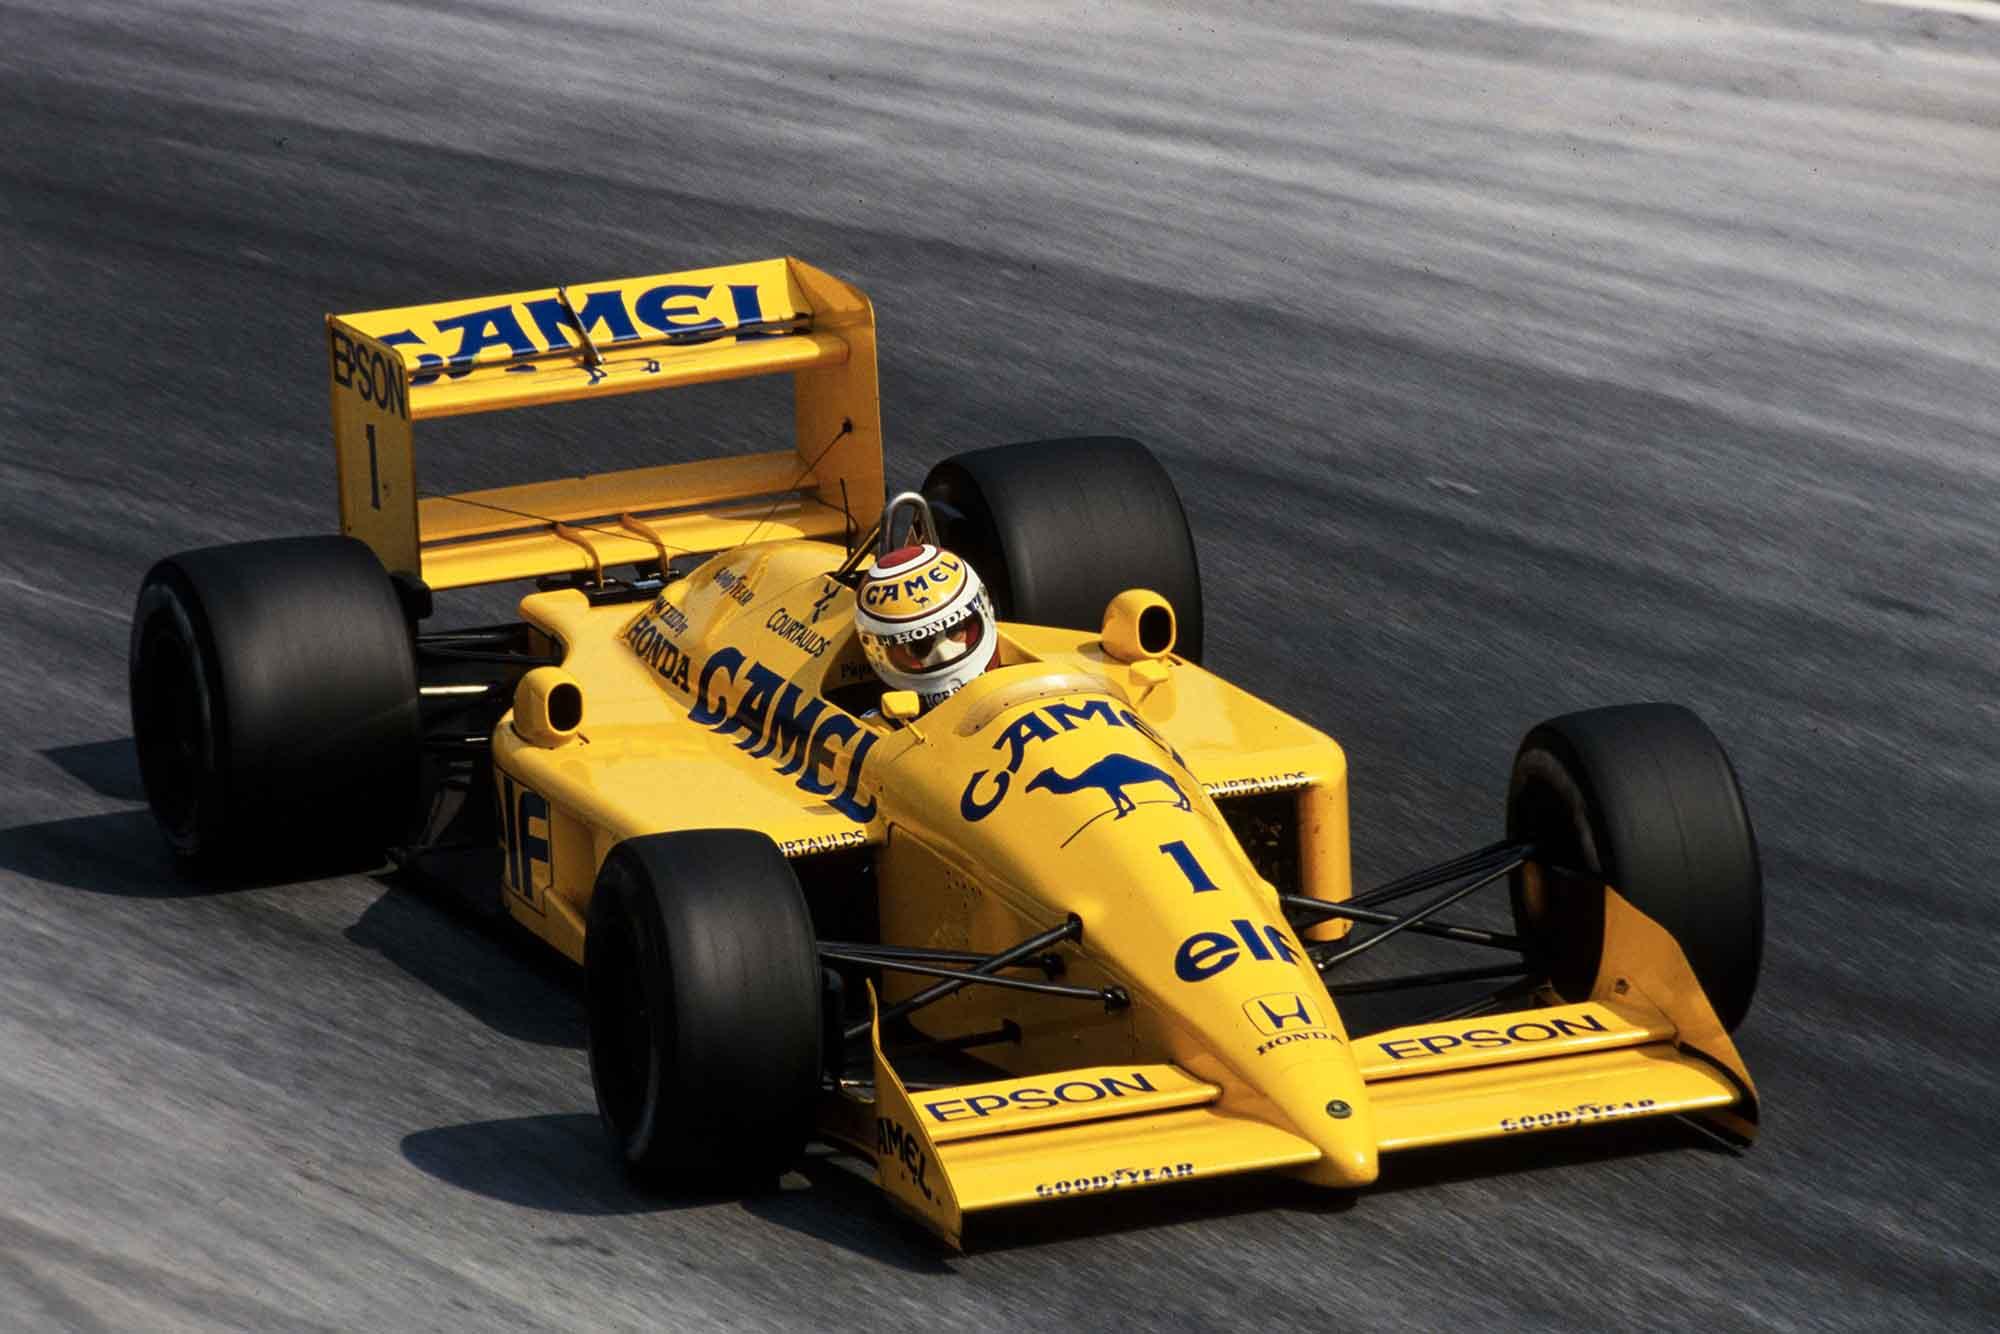 Nelson Piquet in his Lotus-Honda at 1988 Italian Grand Prix